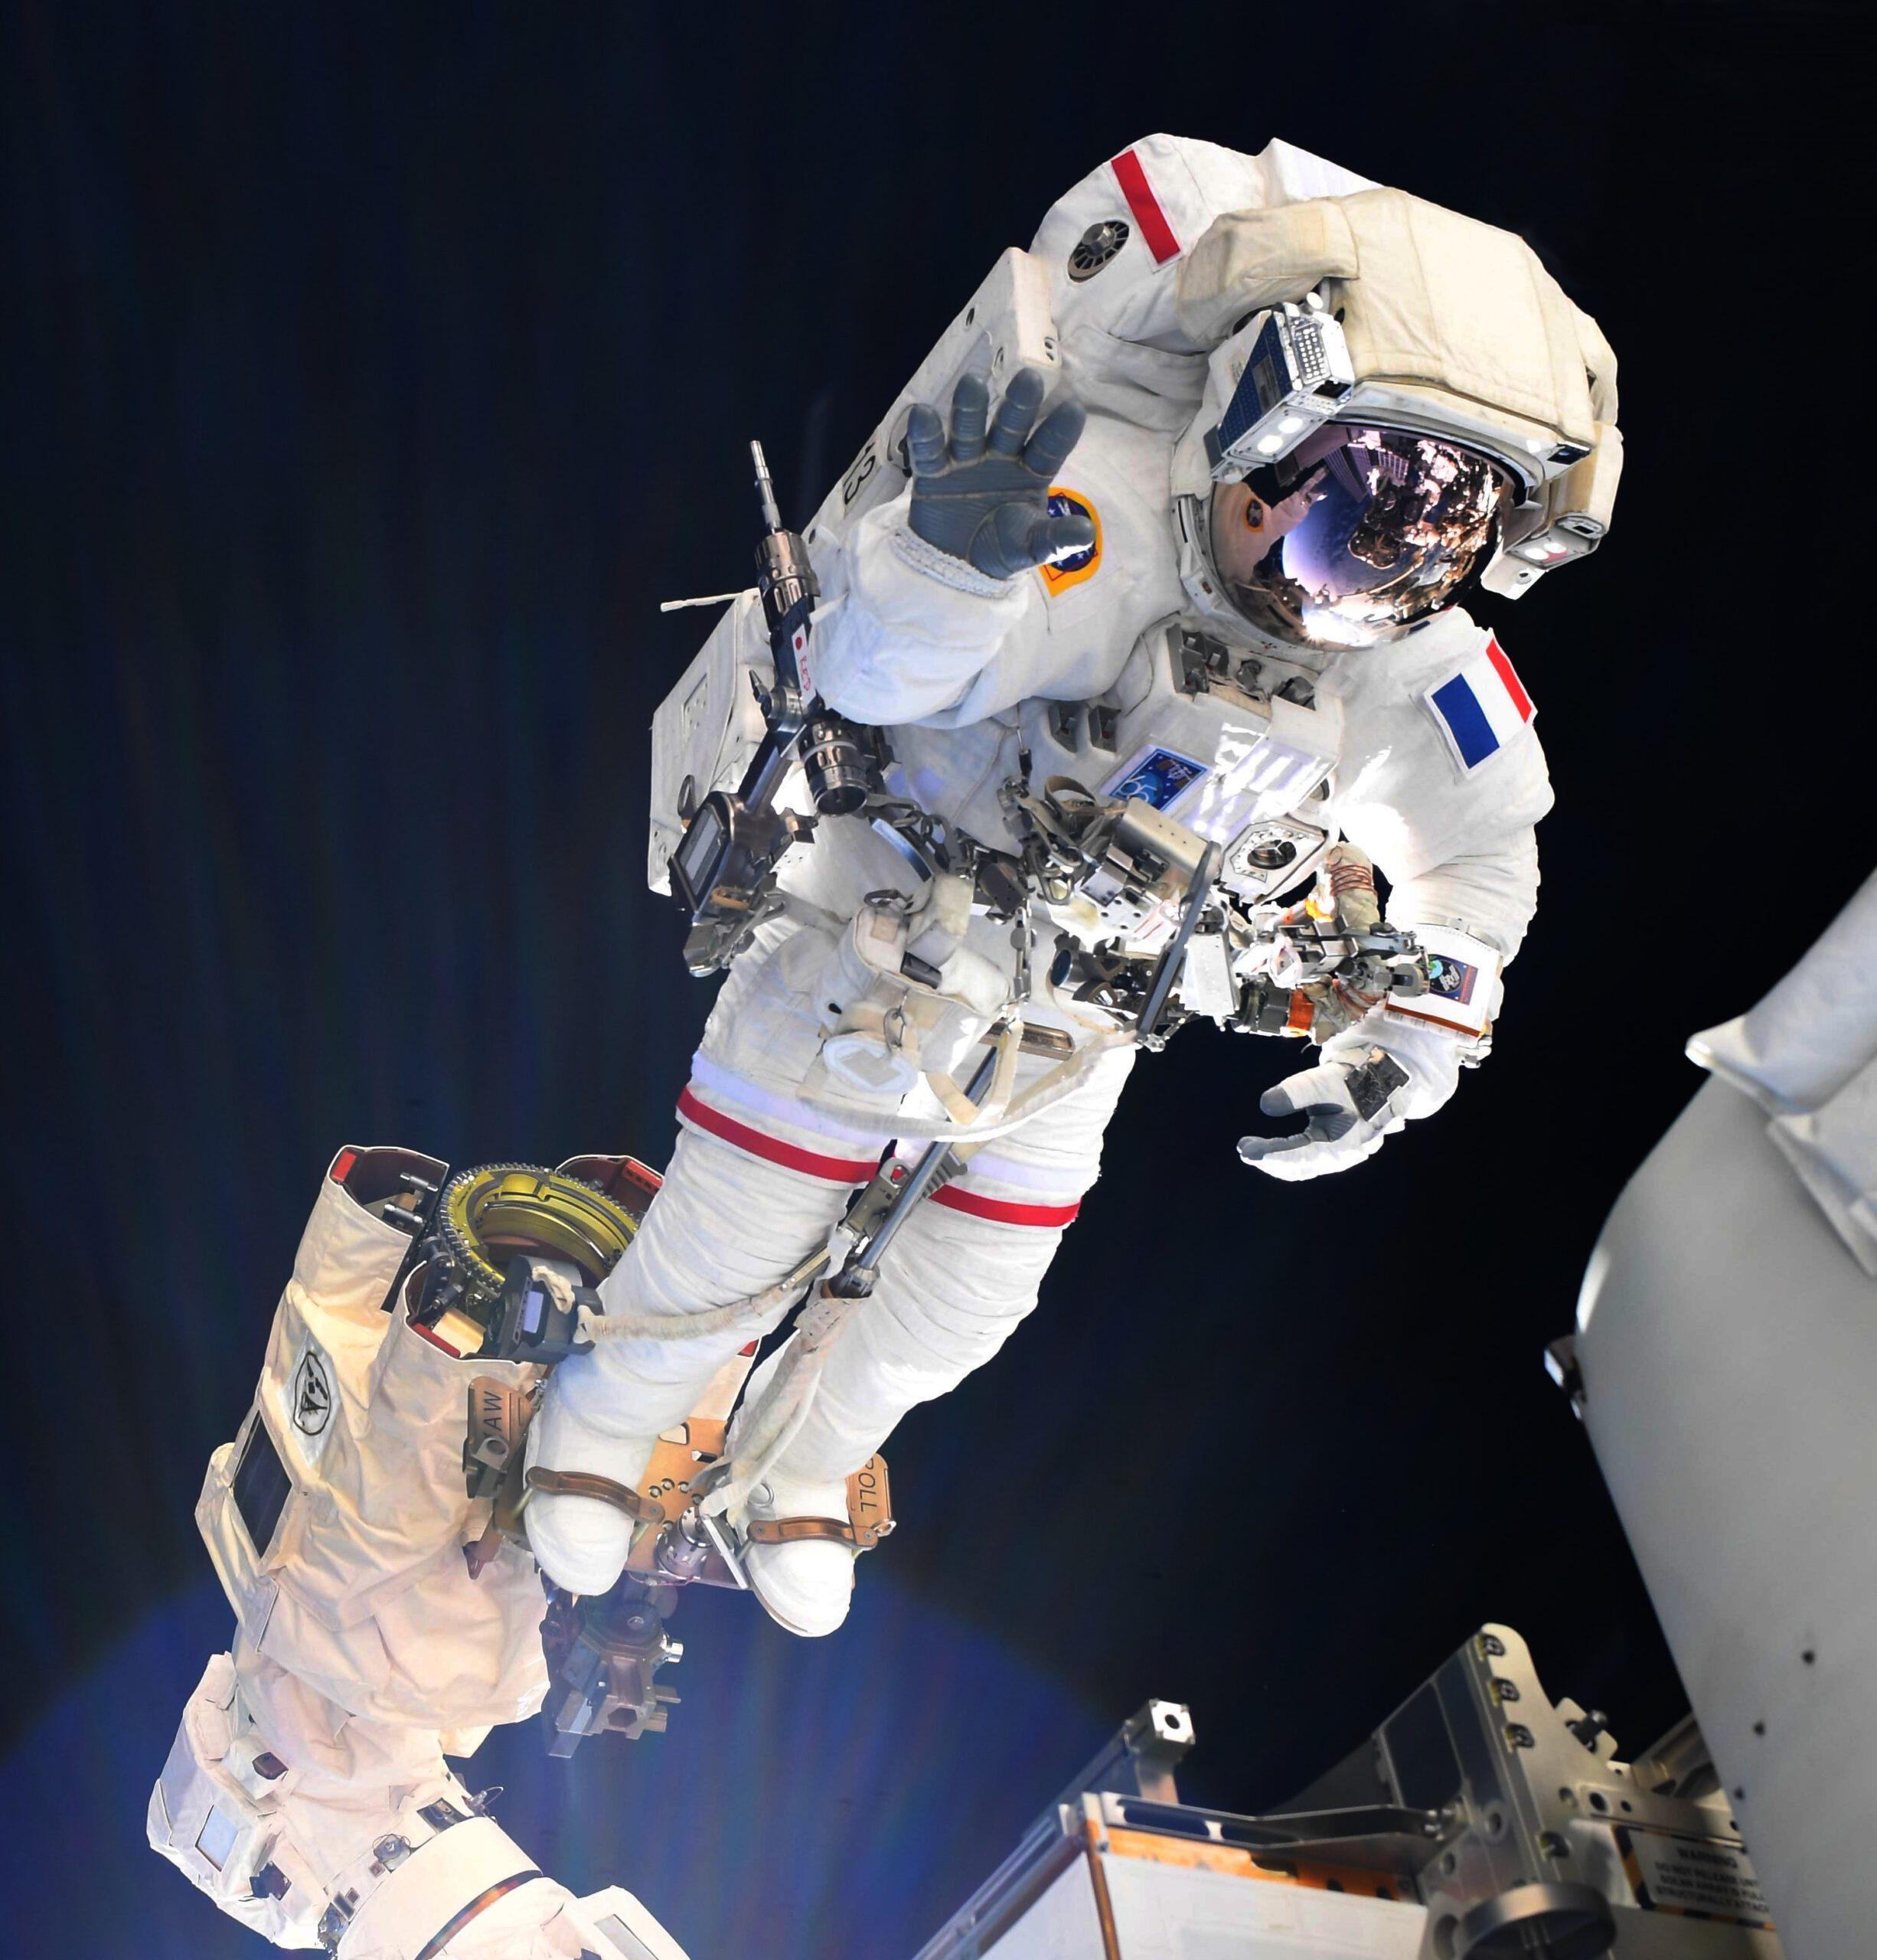 Thomas Pesquet při kosmické vycházce. Zdroj: flick.com